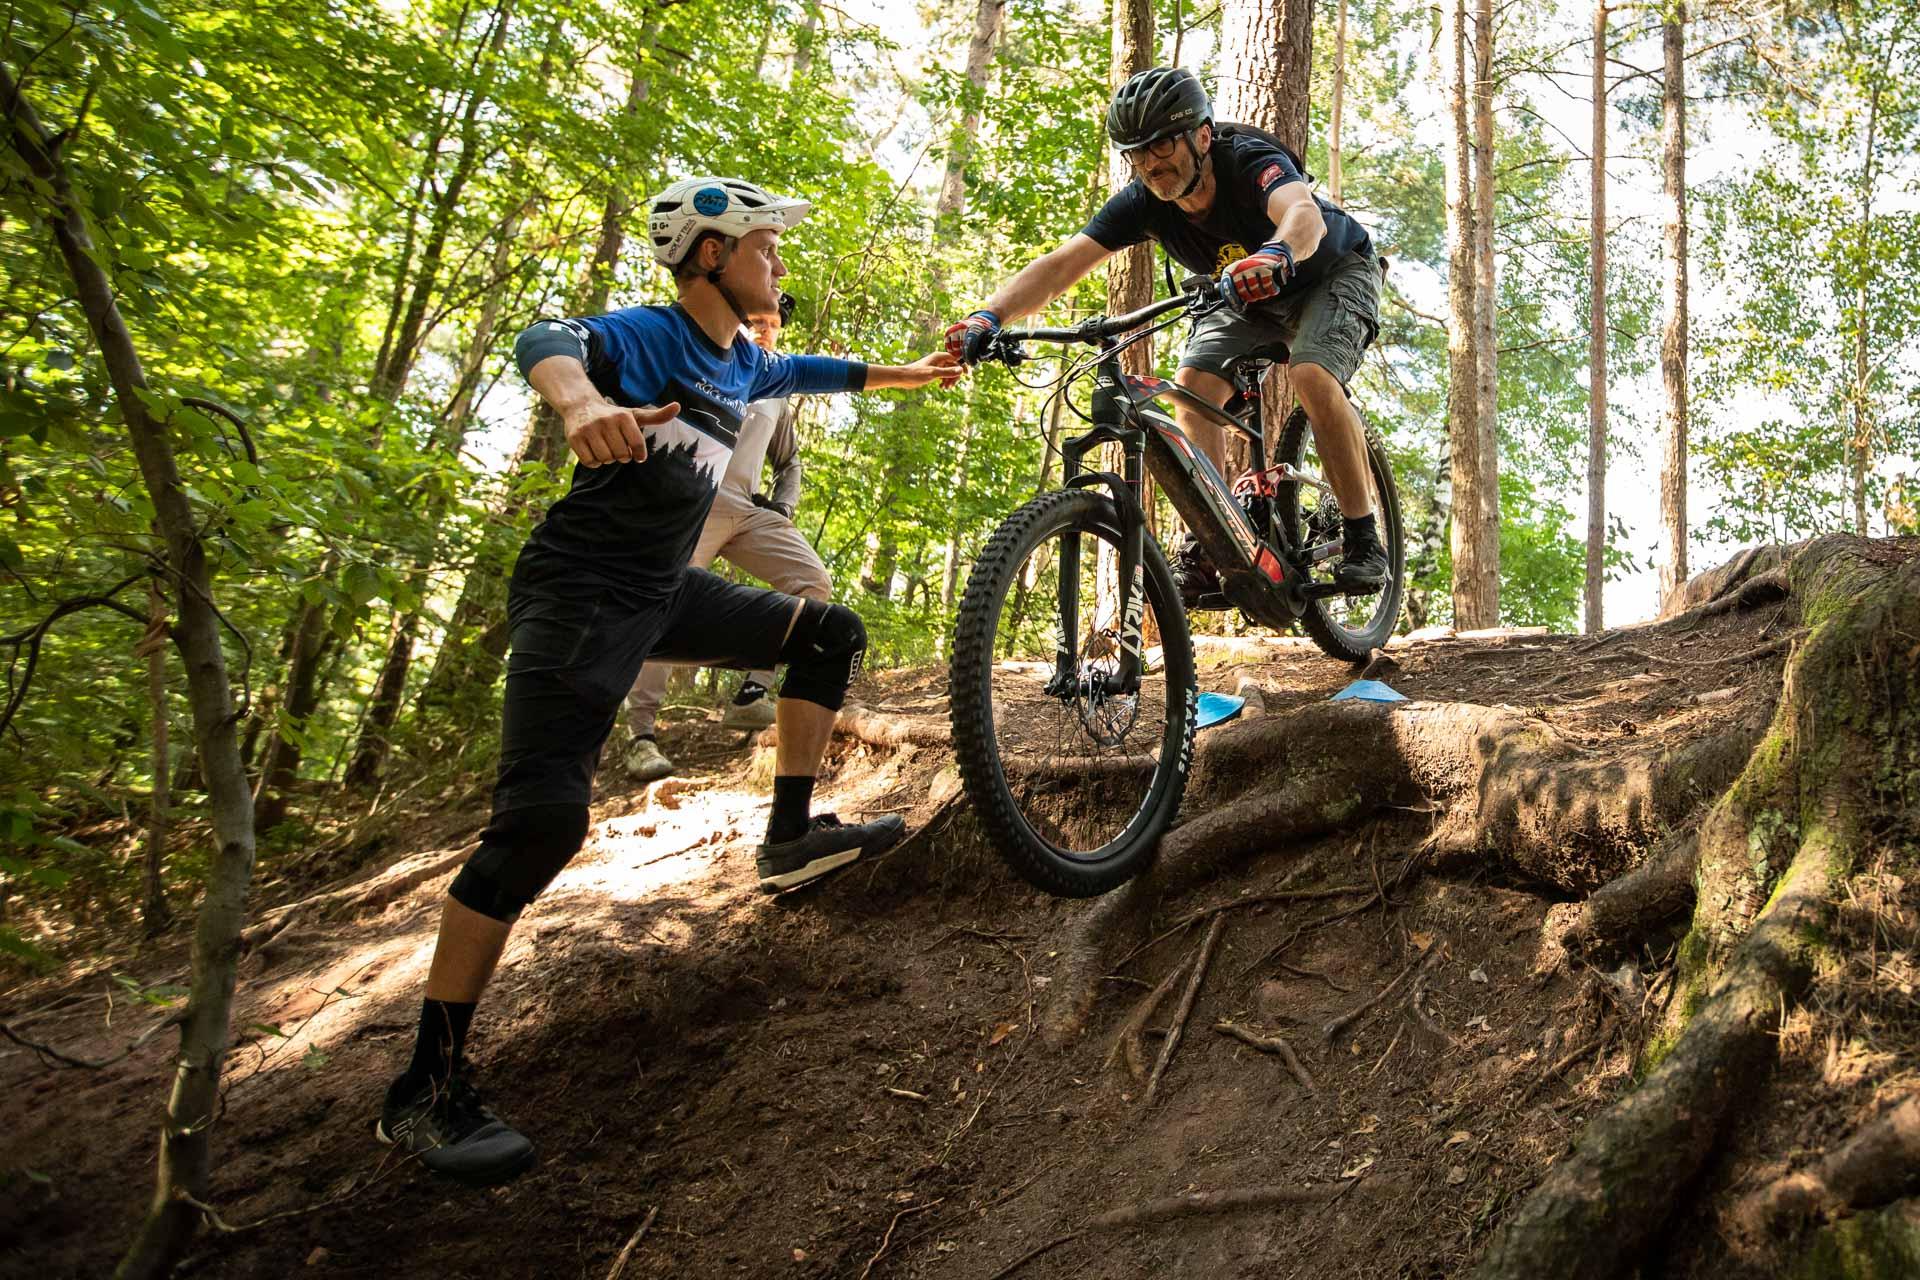 eMTB eBike Fortgeschritten Fahrtechnik Kurs in Siegen - Rock my Trail Bikeschule36